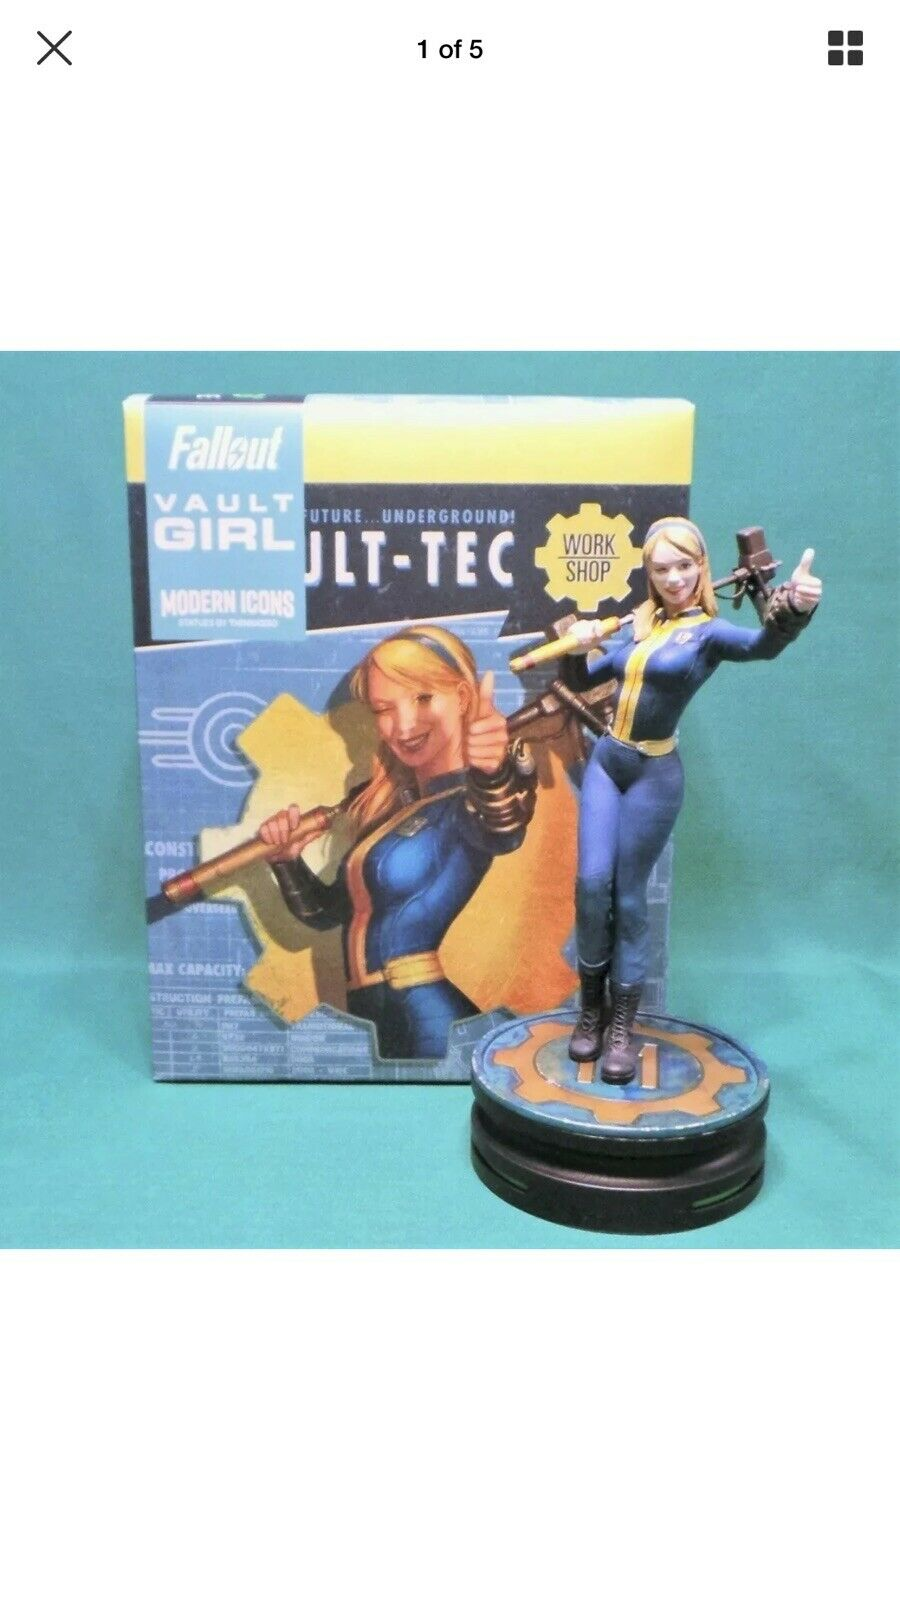 Modern Icons  7 Fallout Vault Girl Estatua 9  Tec estatuilla base nuevo 2019 en la mano